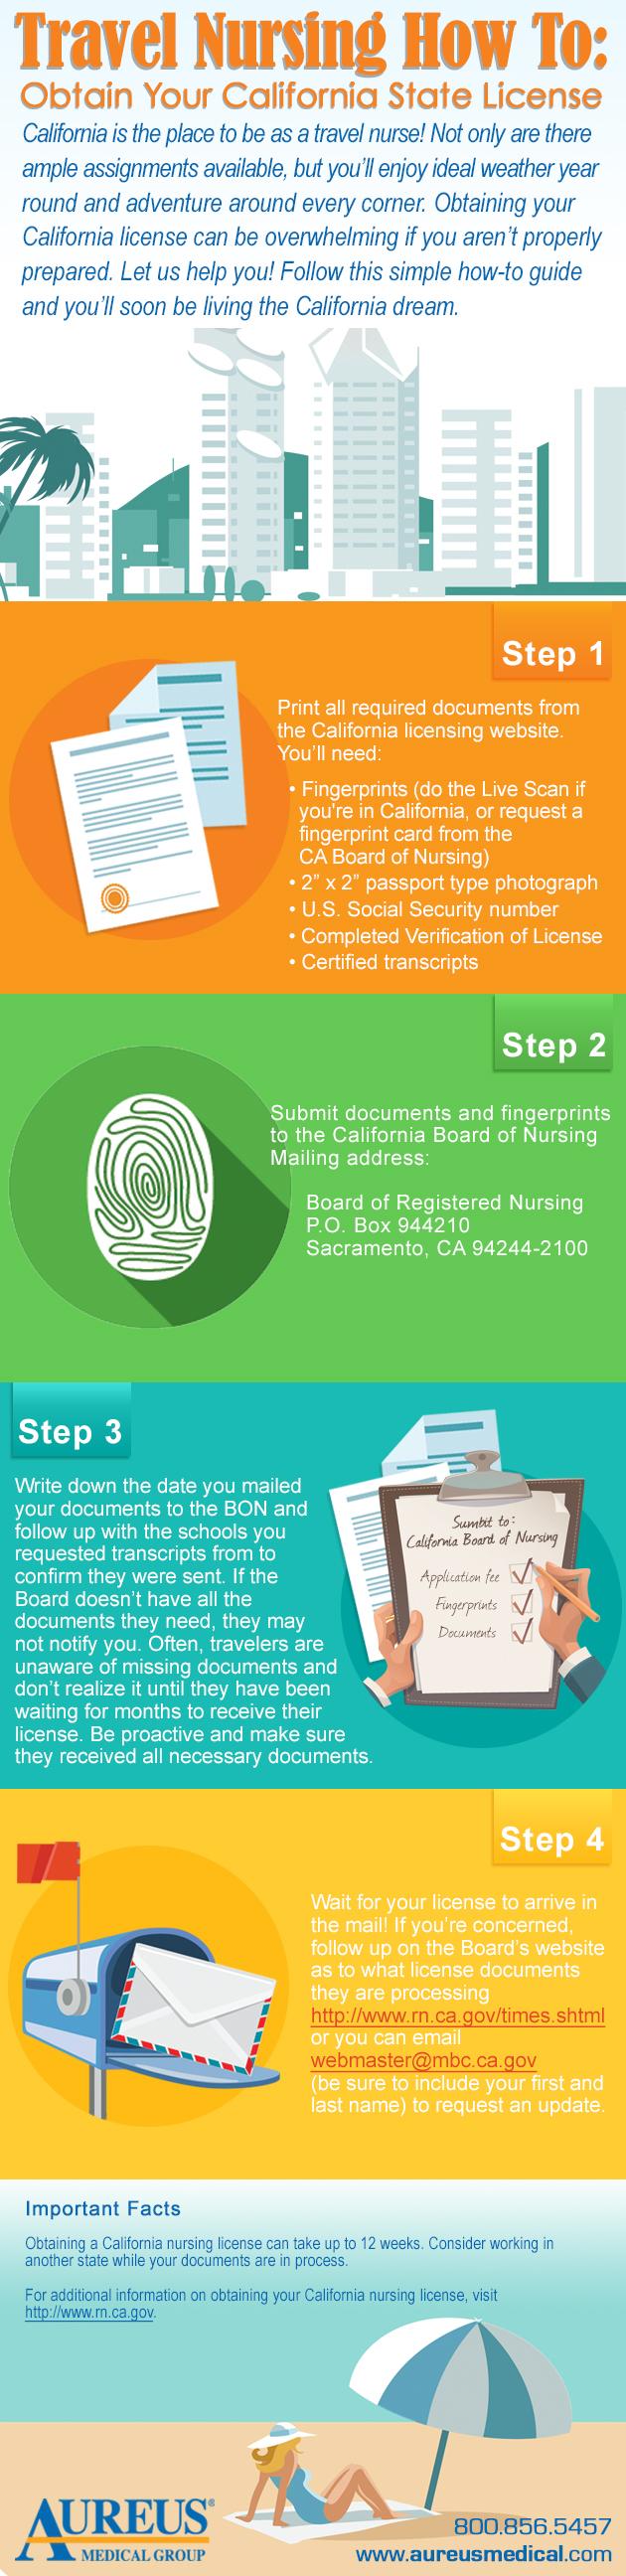 Obtain Your California State License